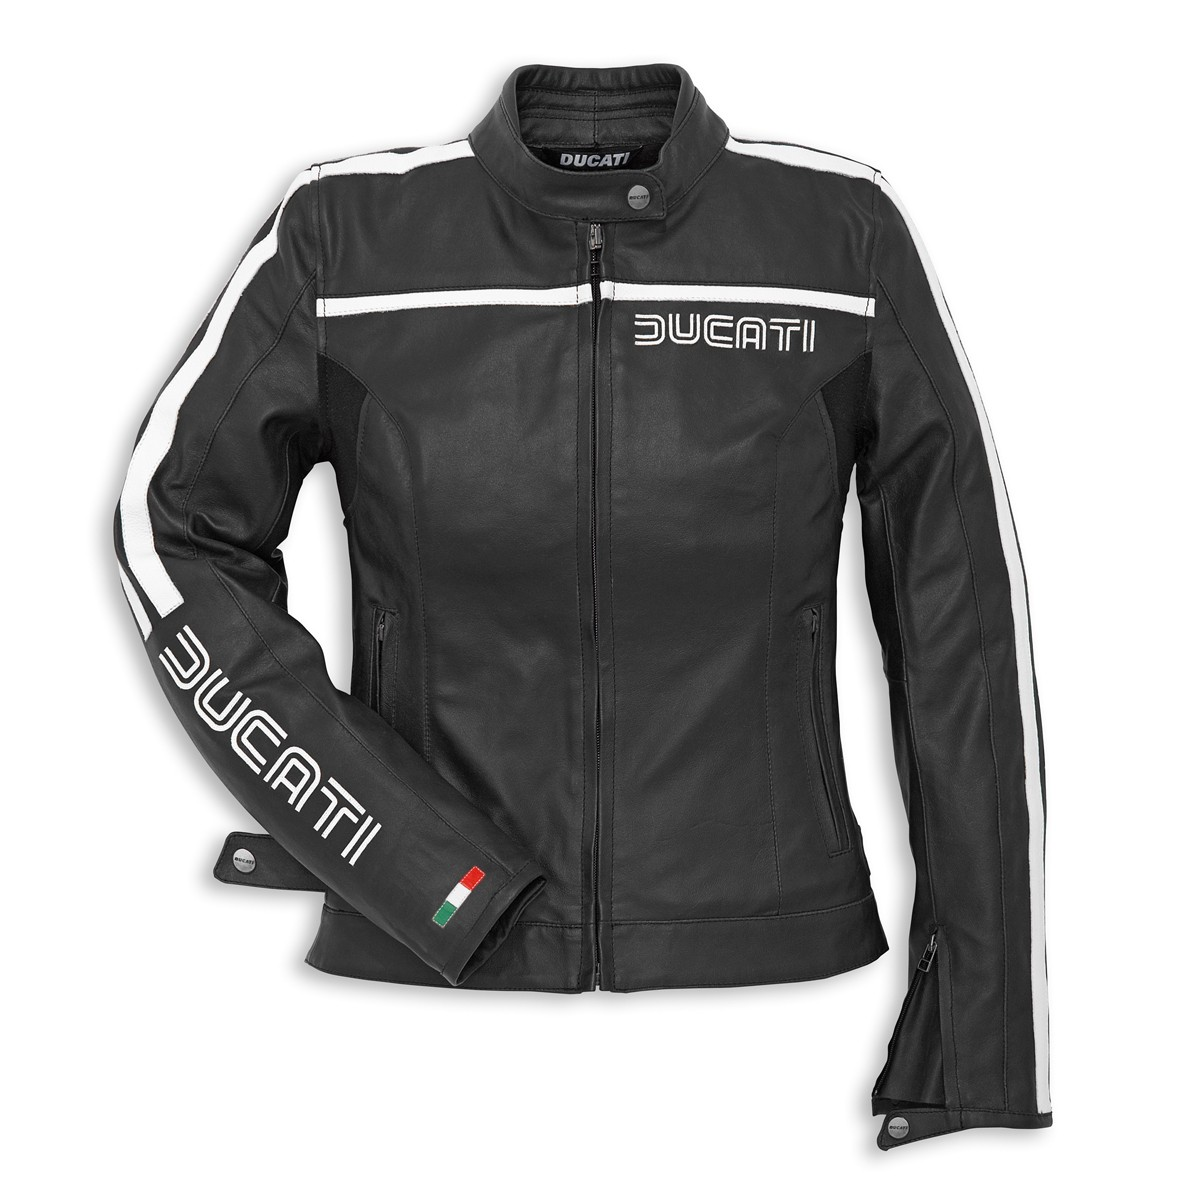 Ducati Womens Leather Jacket